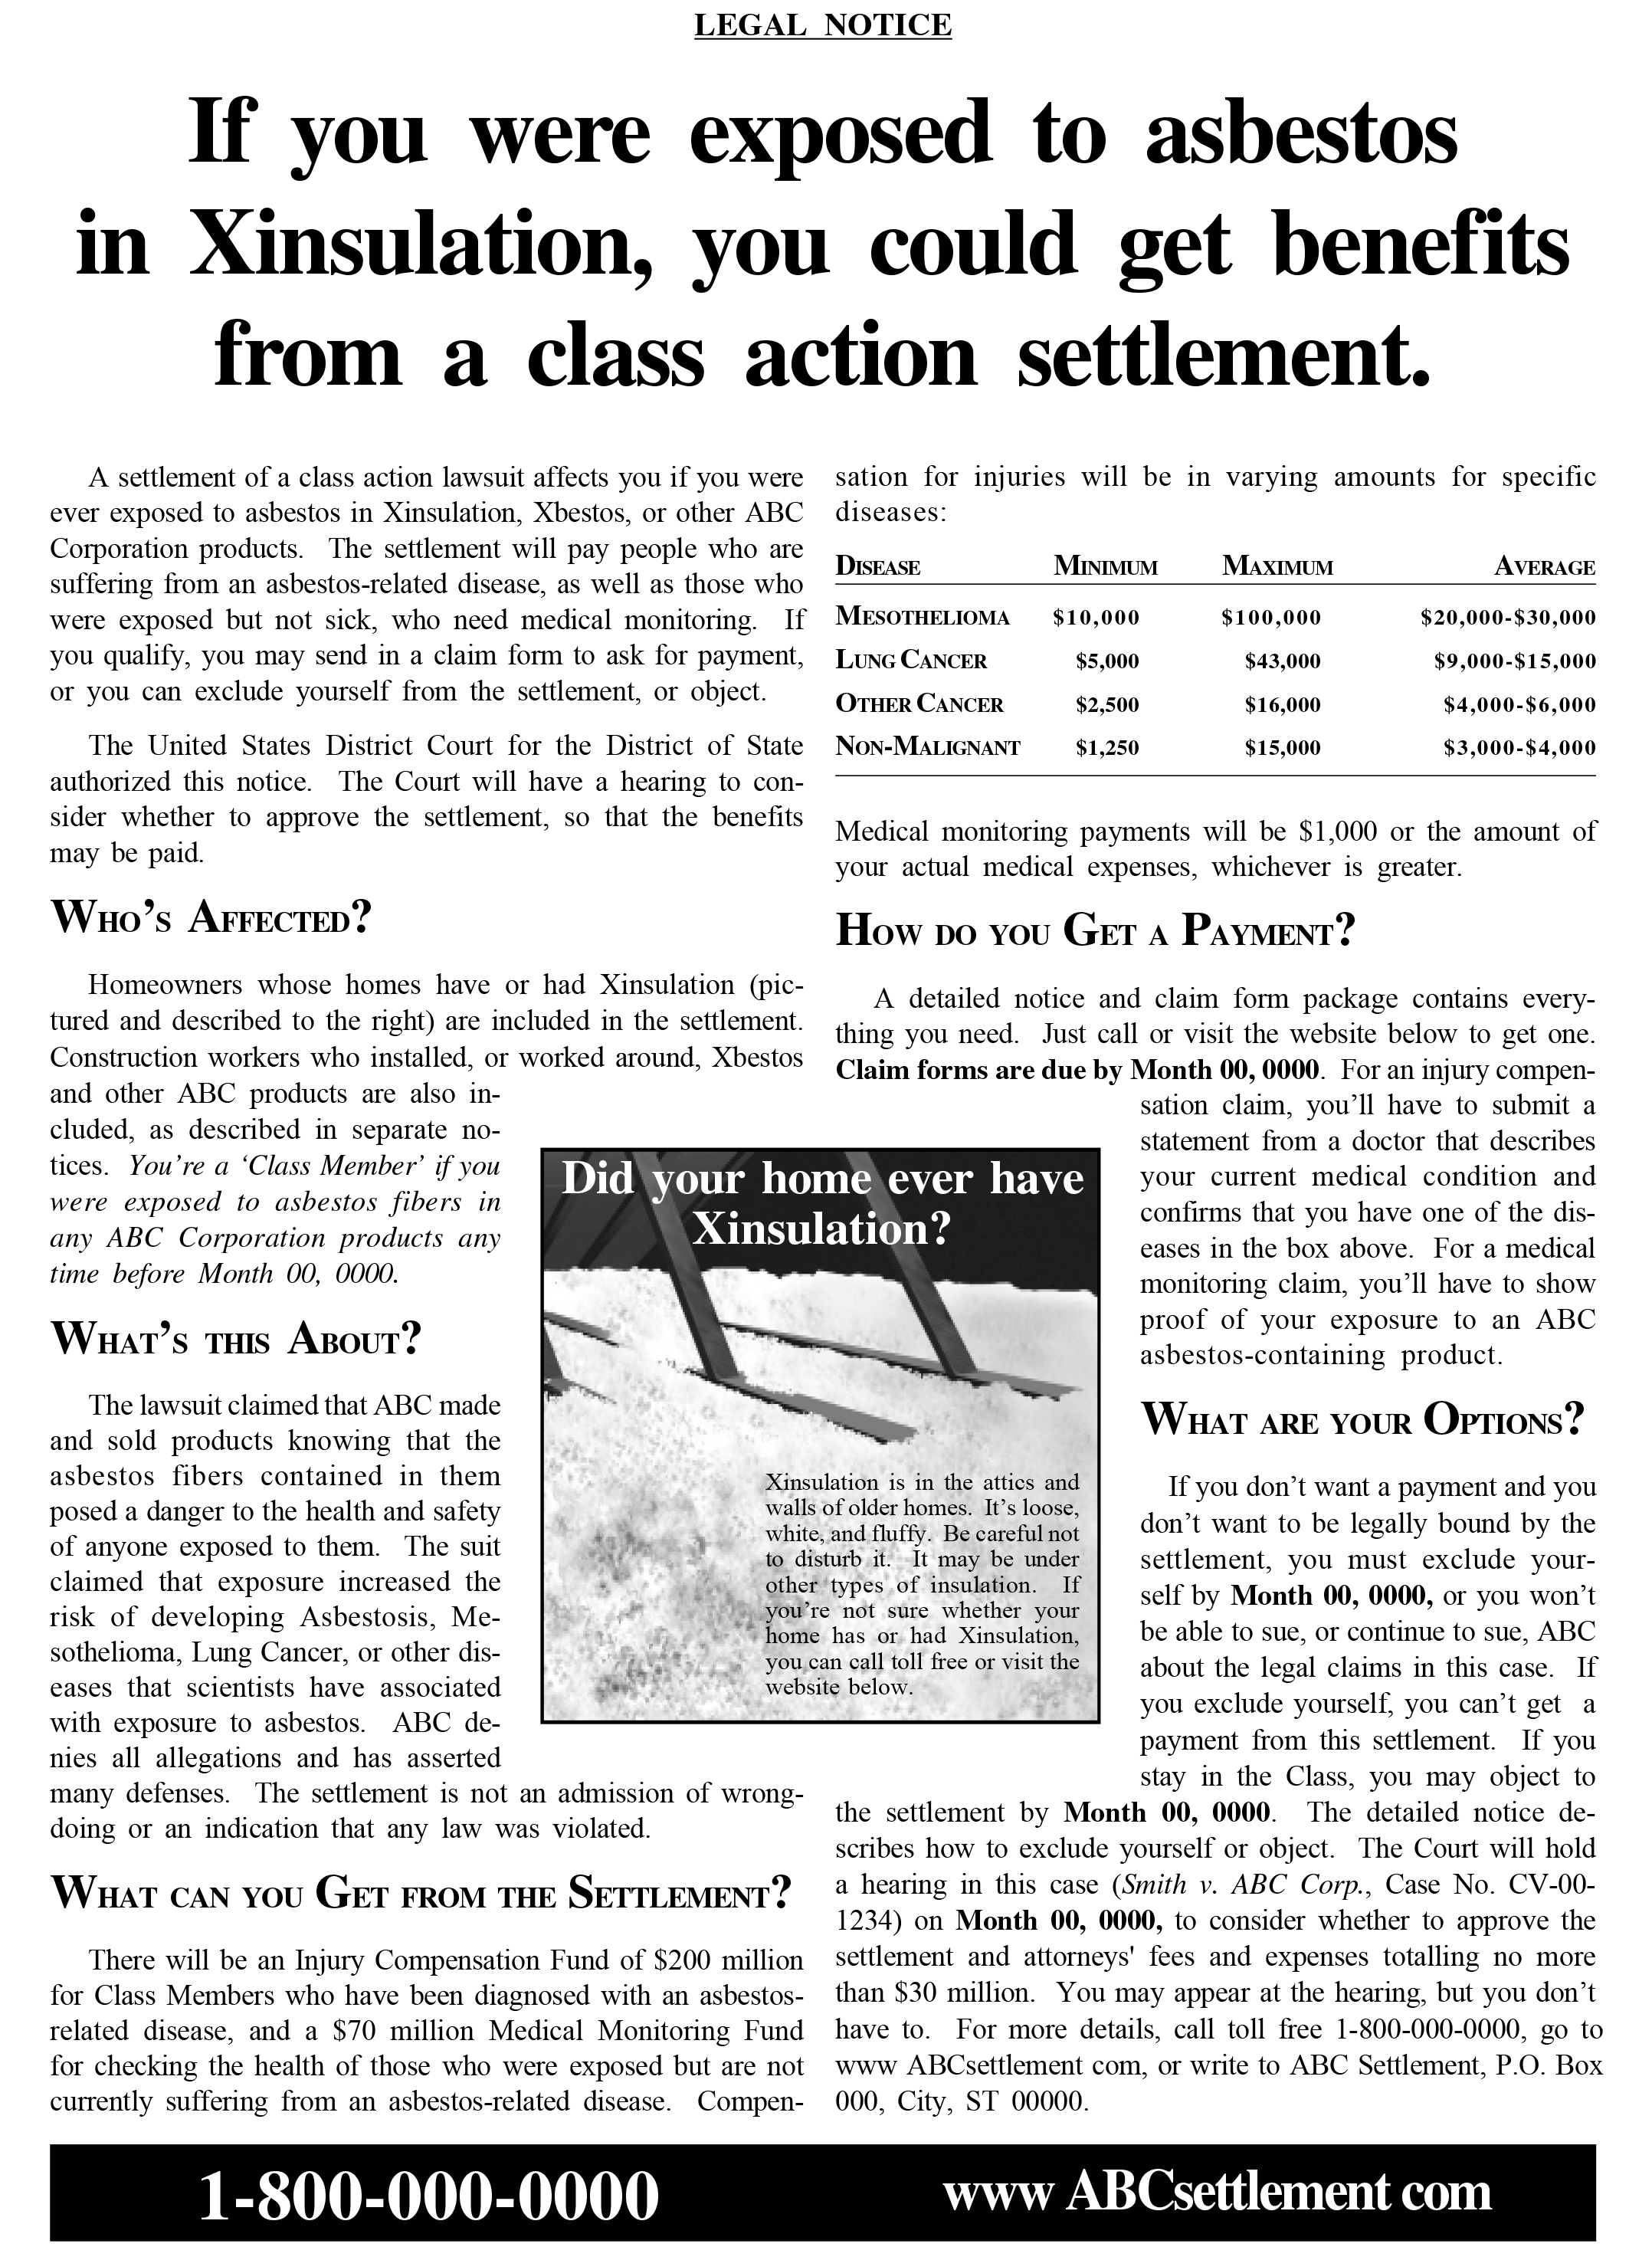 Image 4 - FJC model publication notice[14]